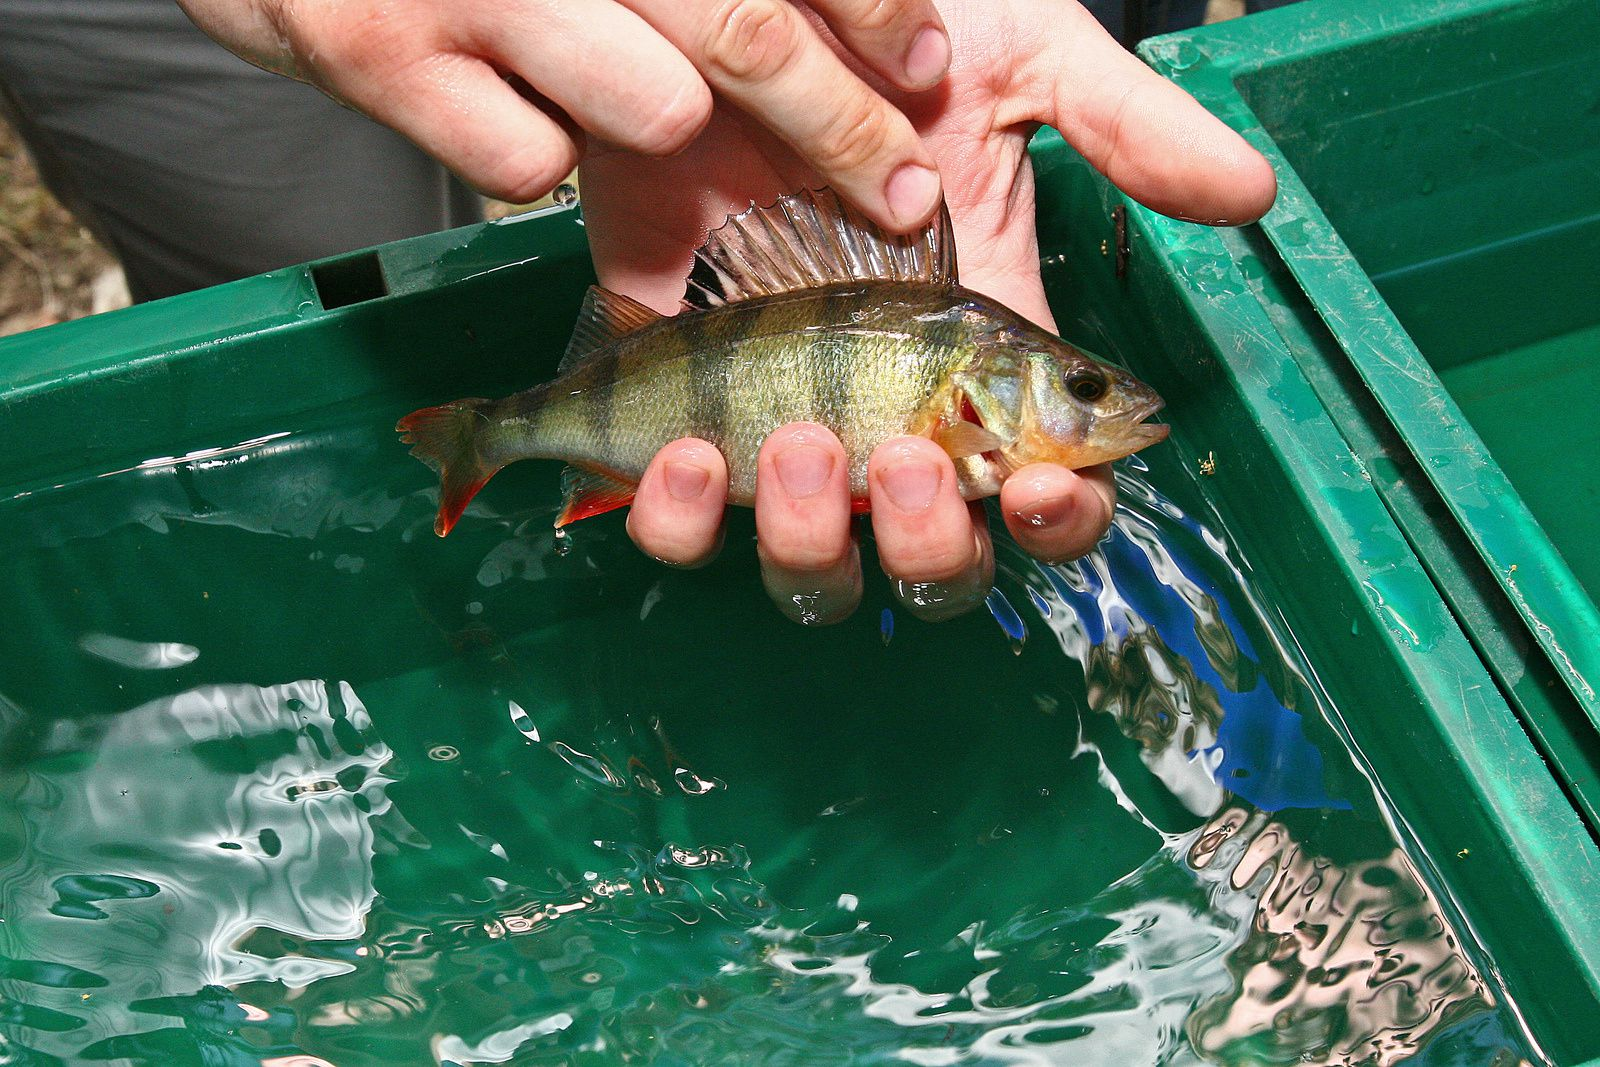 Petit poisson deviendra grand